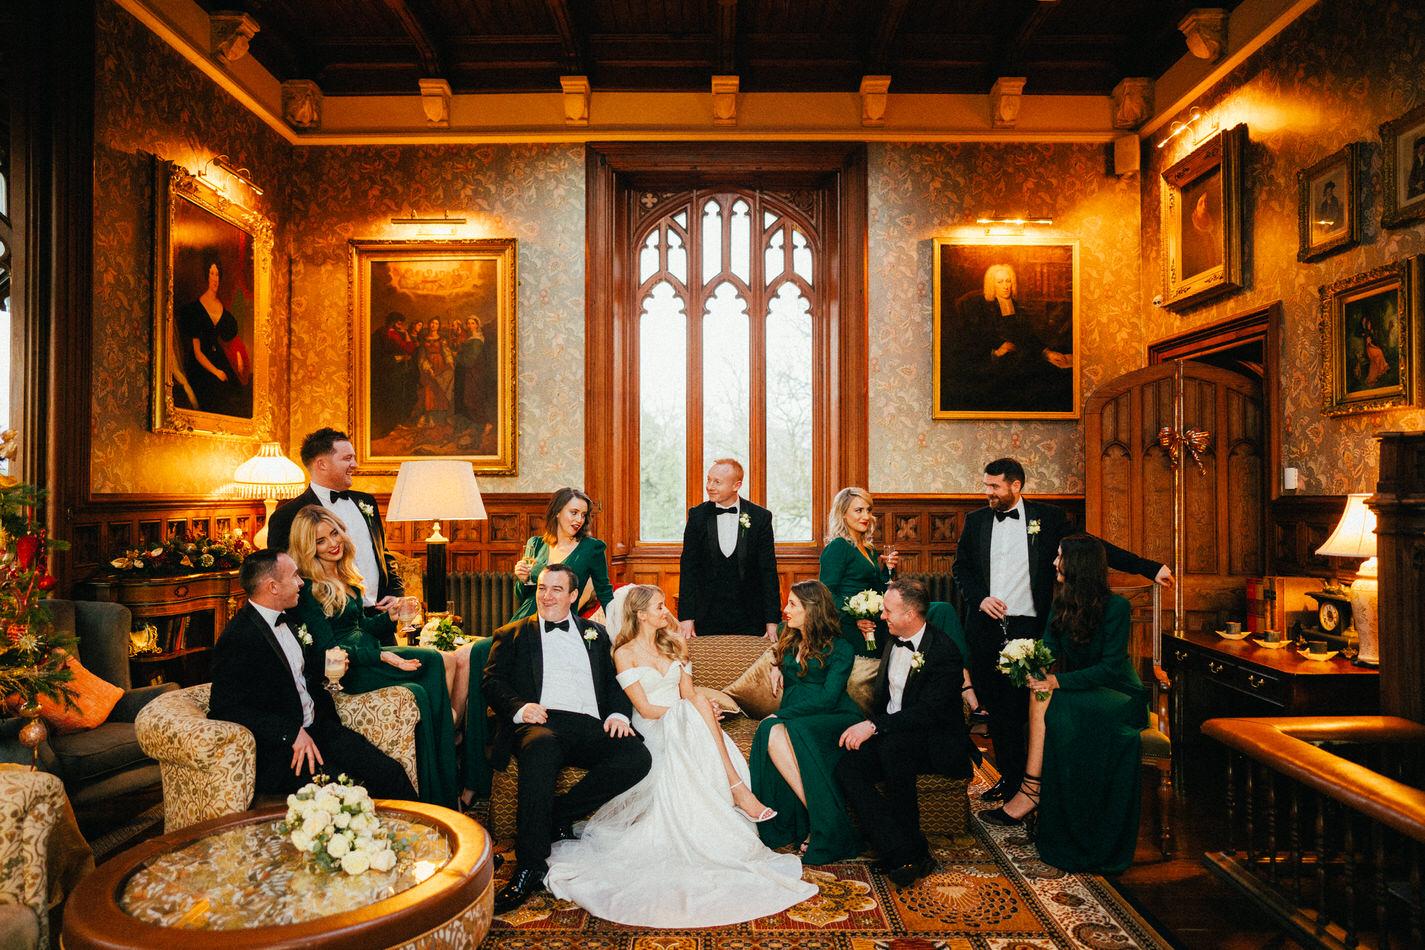 Castle-wedding-ireland-photos- 0243 182